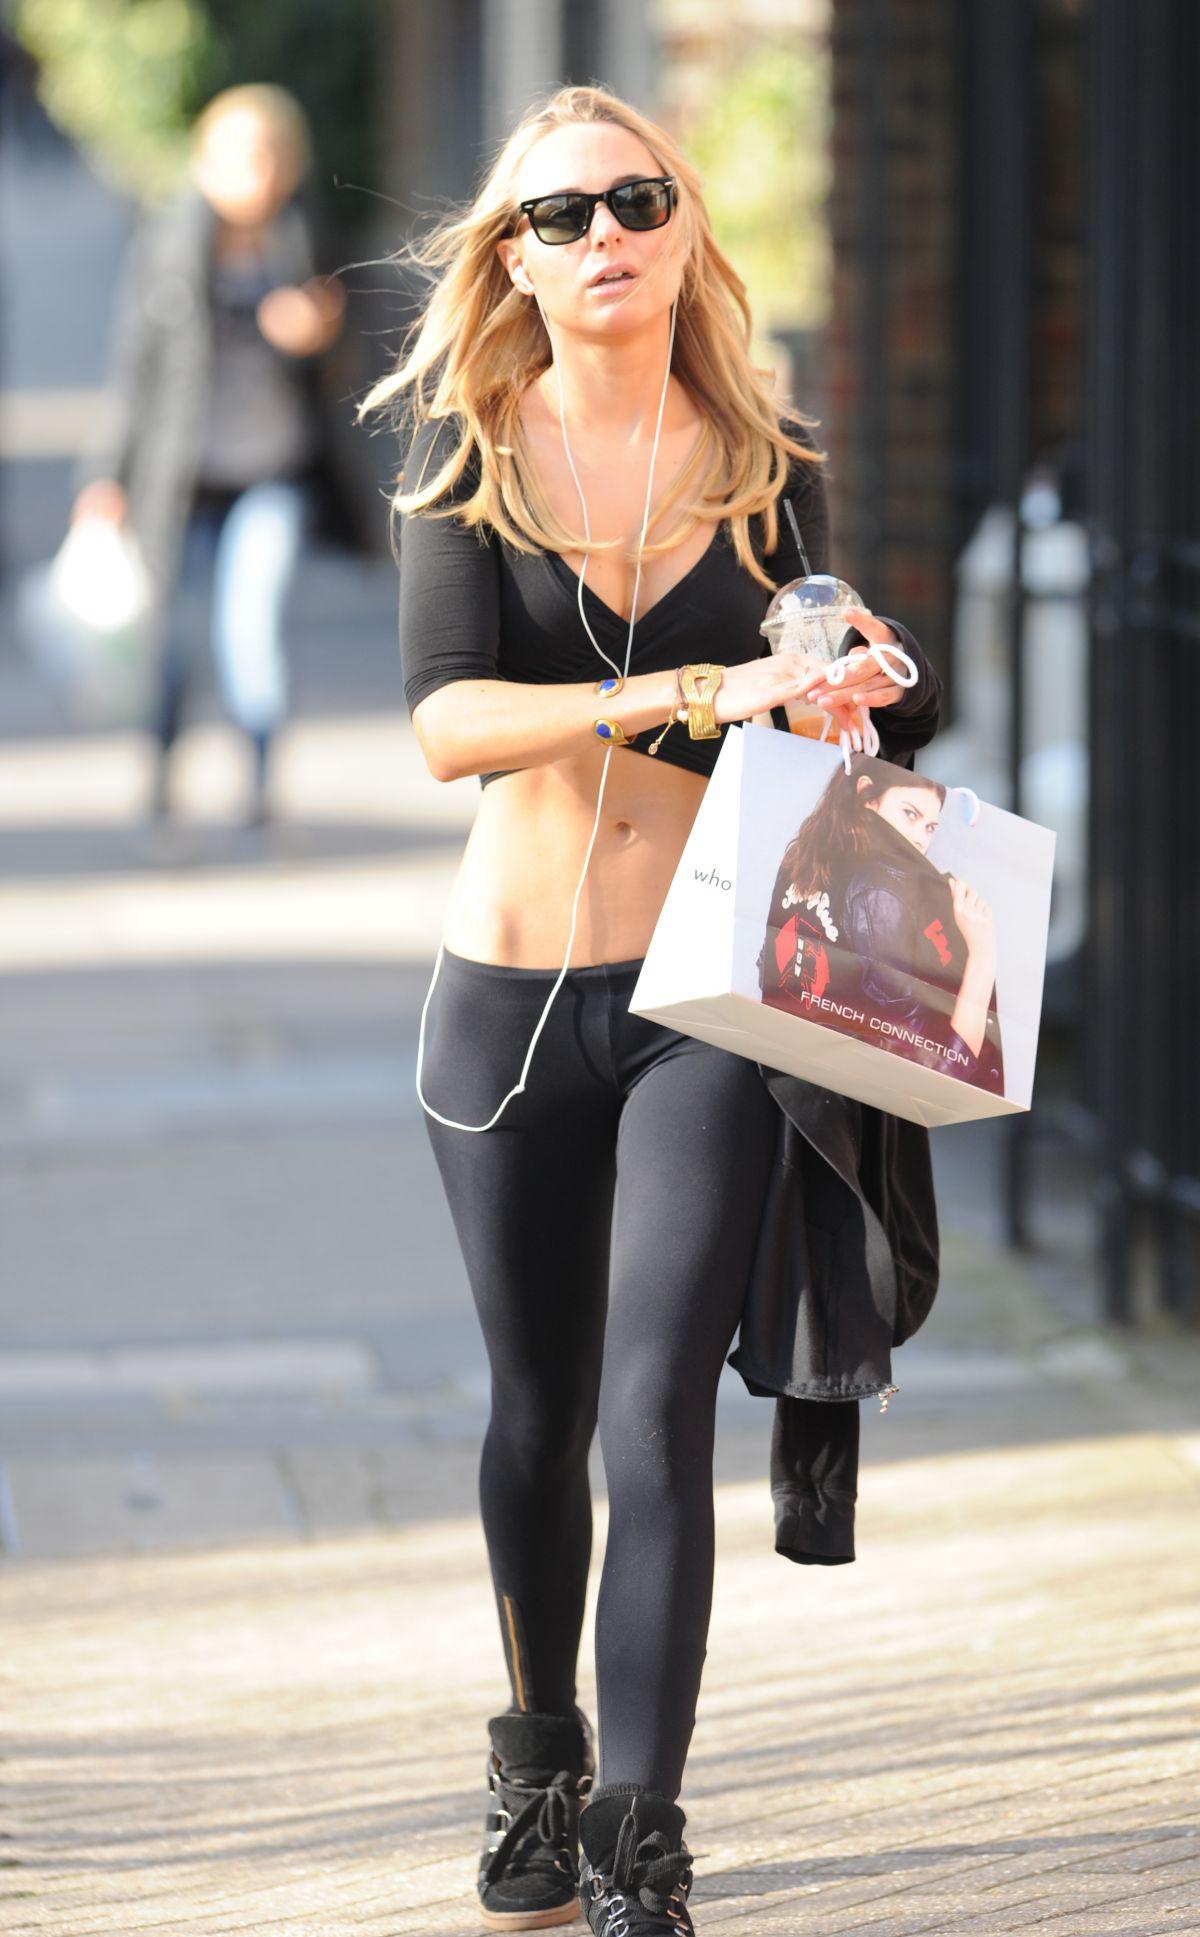 KIMBERLEY GARNER in Tights Leaves a Gym in London